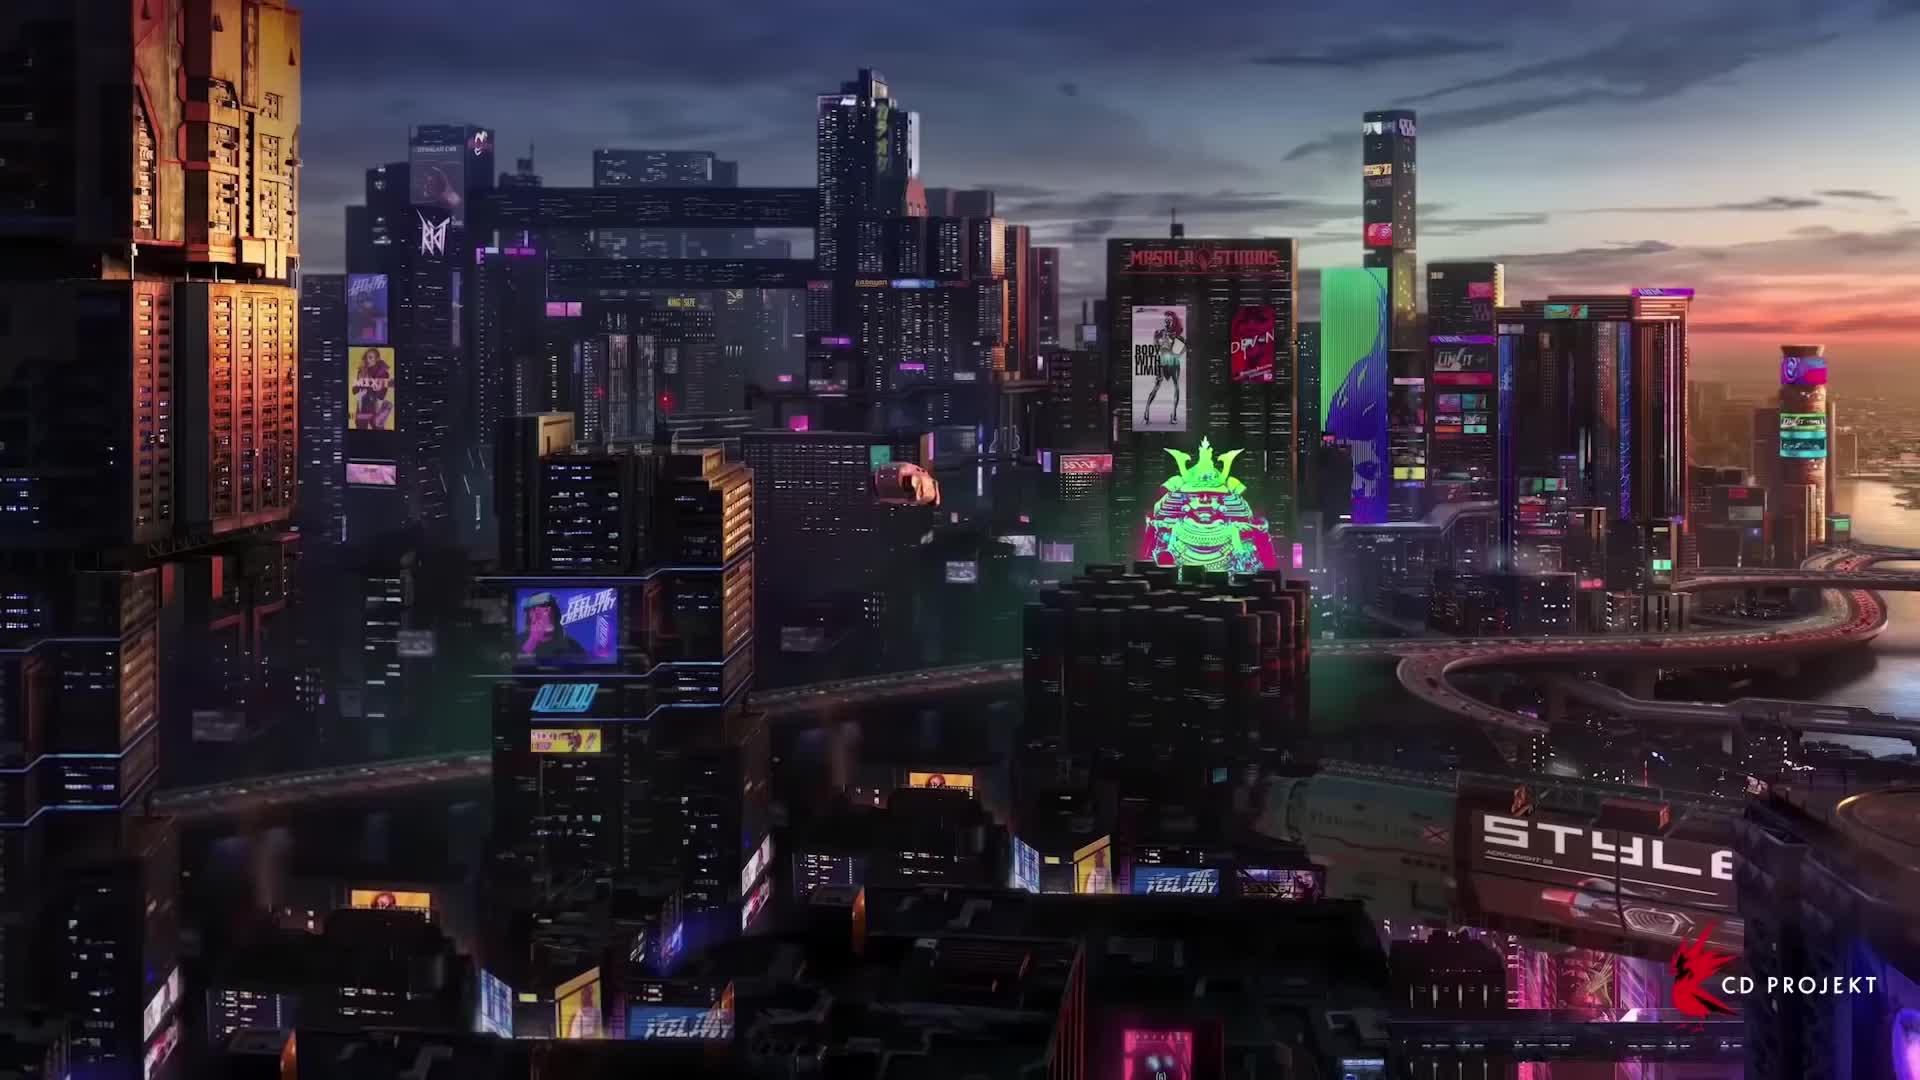 Cyberpunk 2077 Night City Live Wallpaper 1080 P